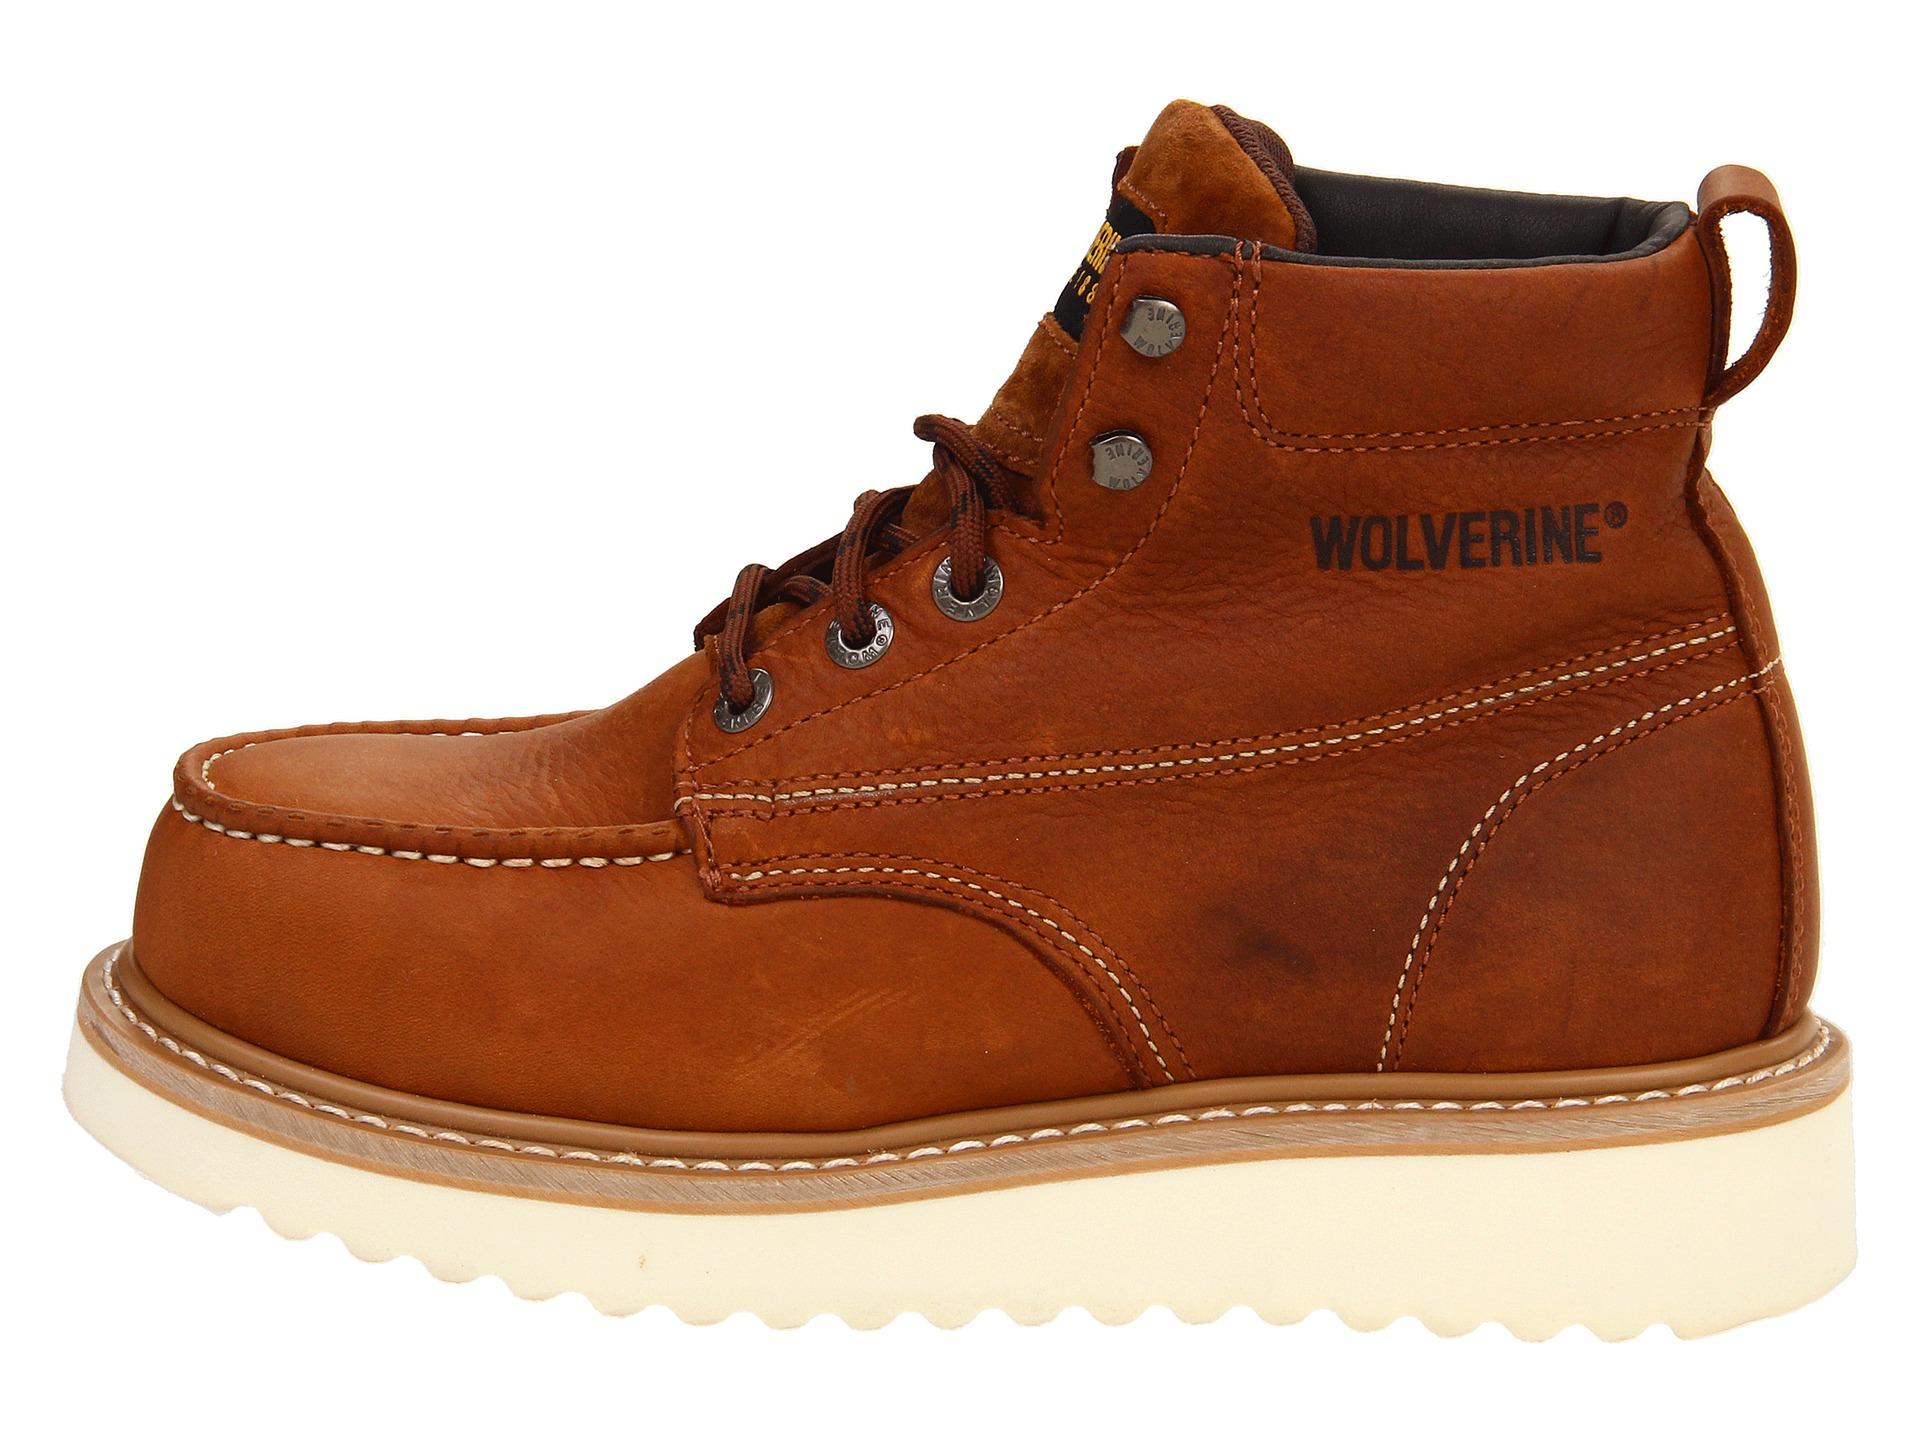 wolverine moc toe wedge heel steel toe at zappos